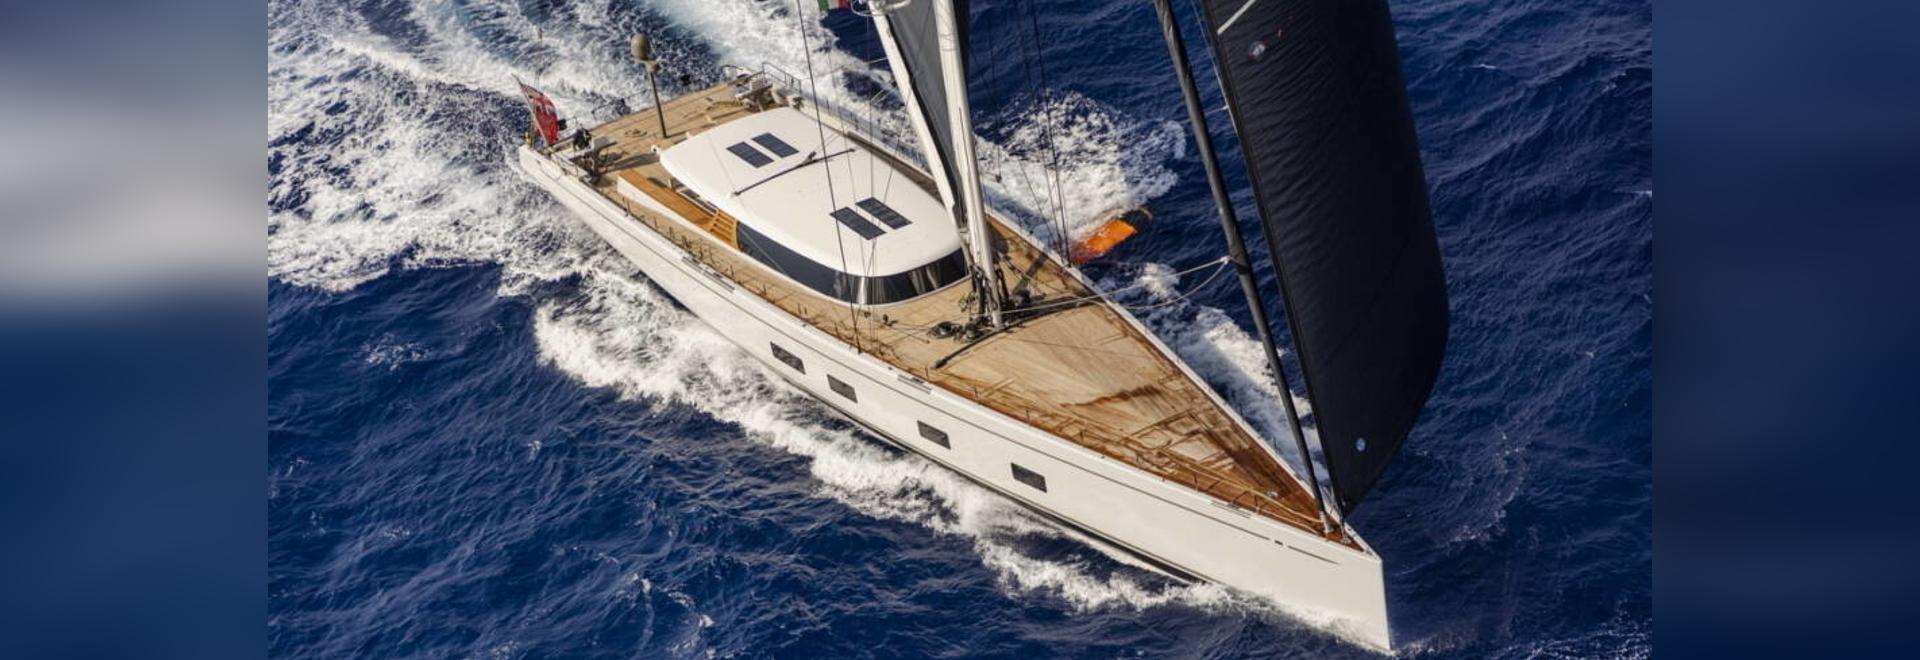 Canova – The foiling superyacht designed for comfort